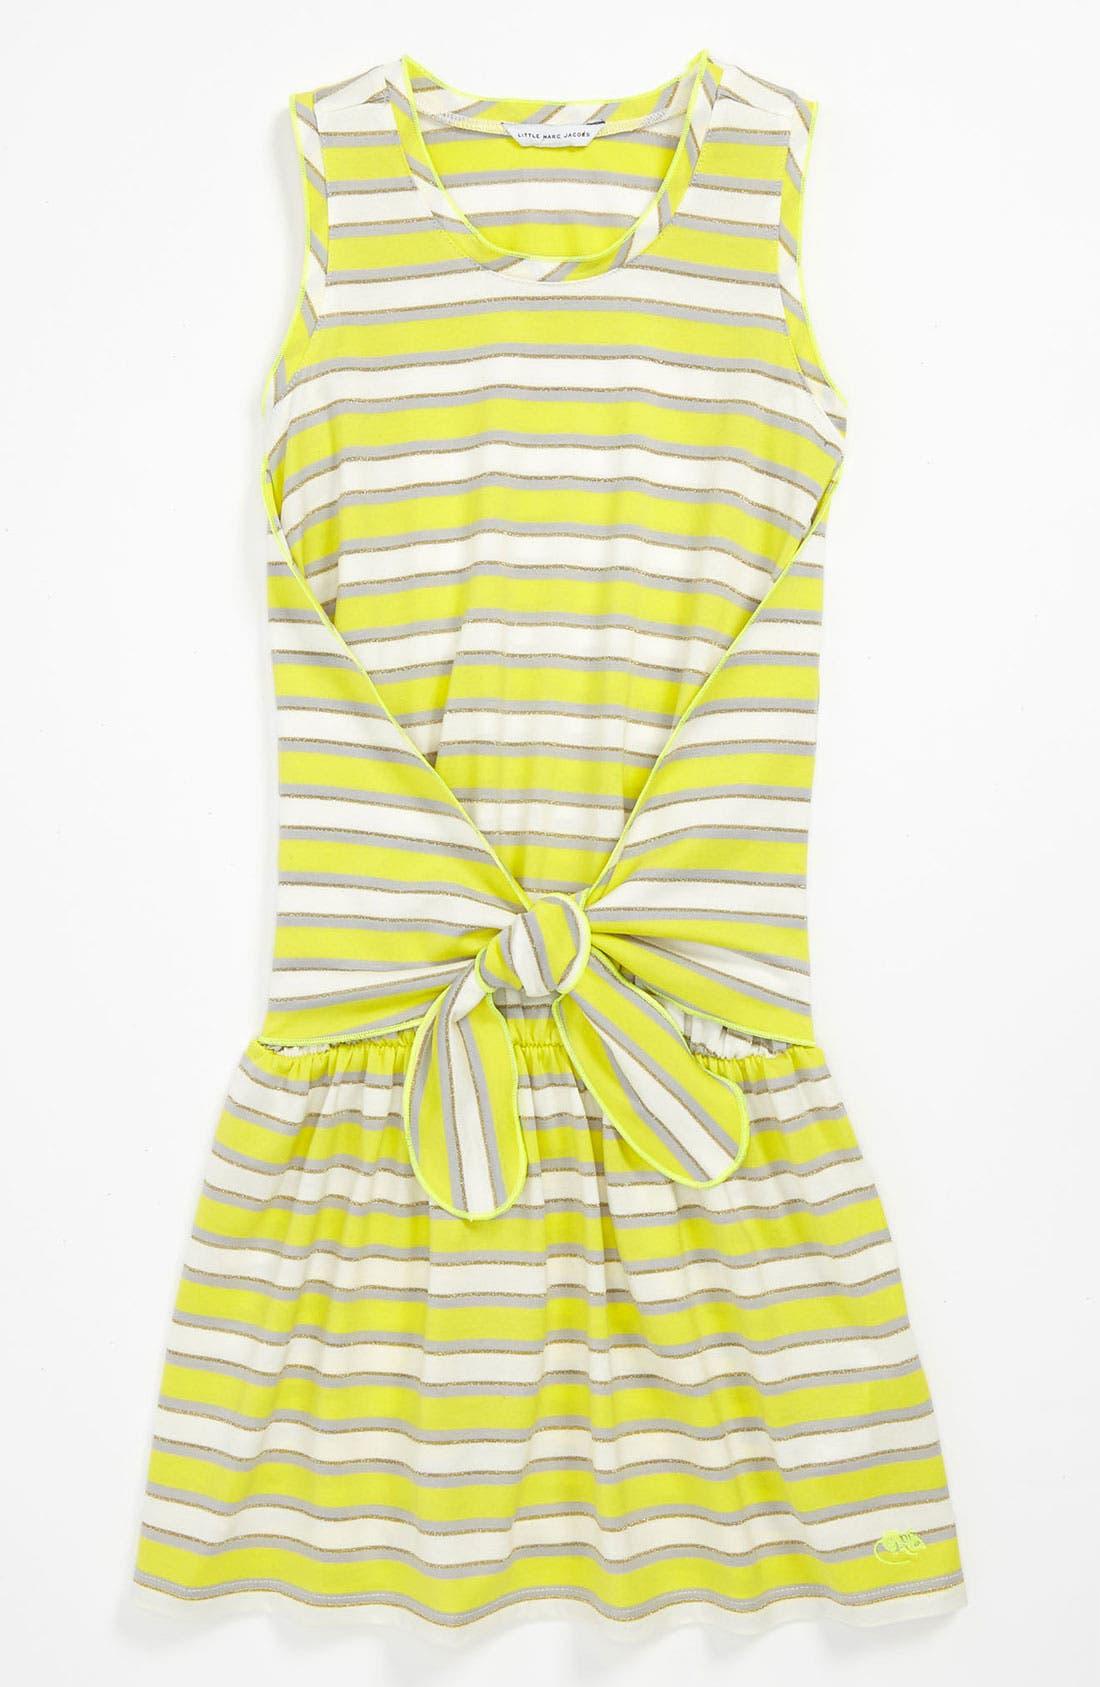 Main Image - LITTLE MARC JACOBS Sleeveless Chambray Dress (Little Girls & Big Girls)